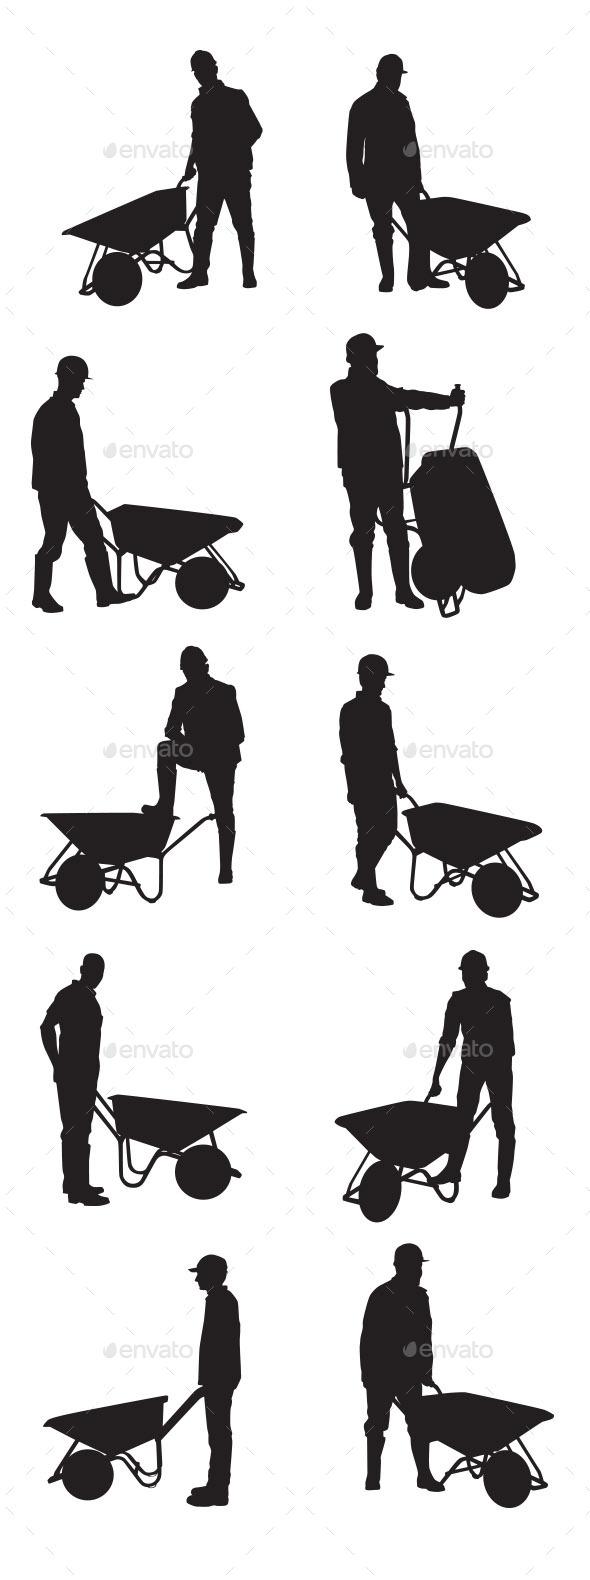 GraphicRiver People Using Wheelbarrow 9375445